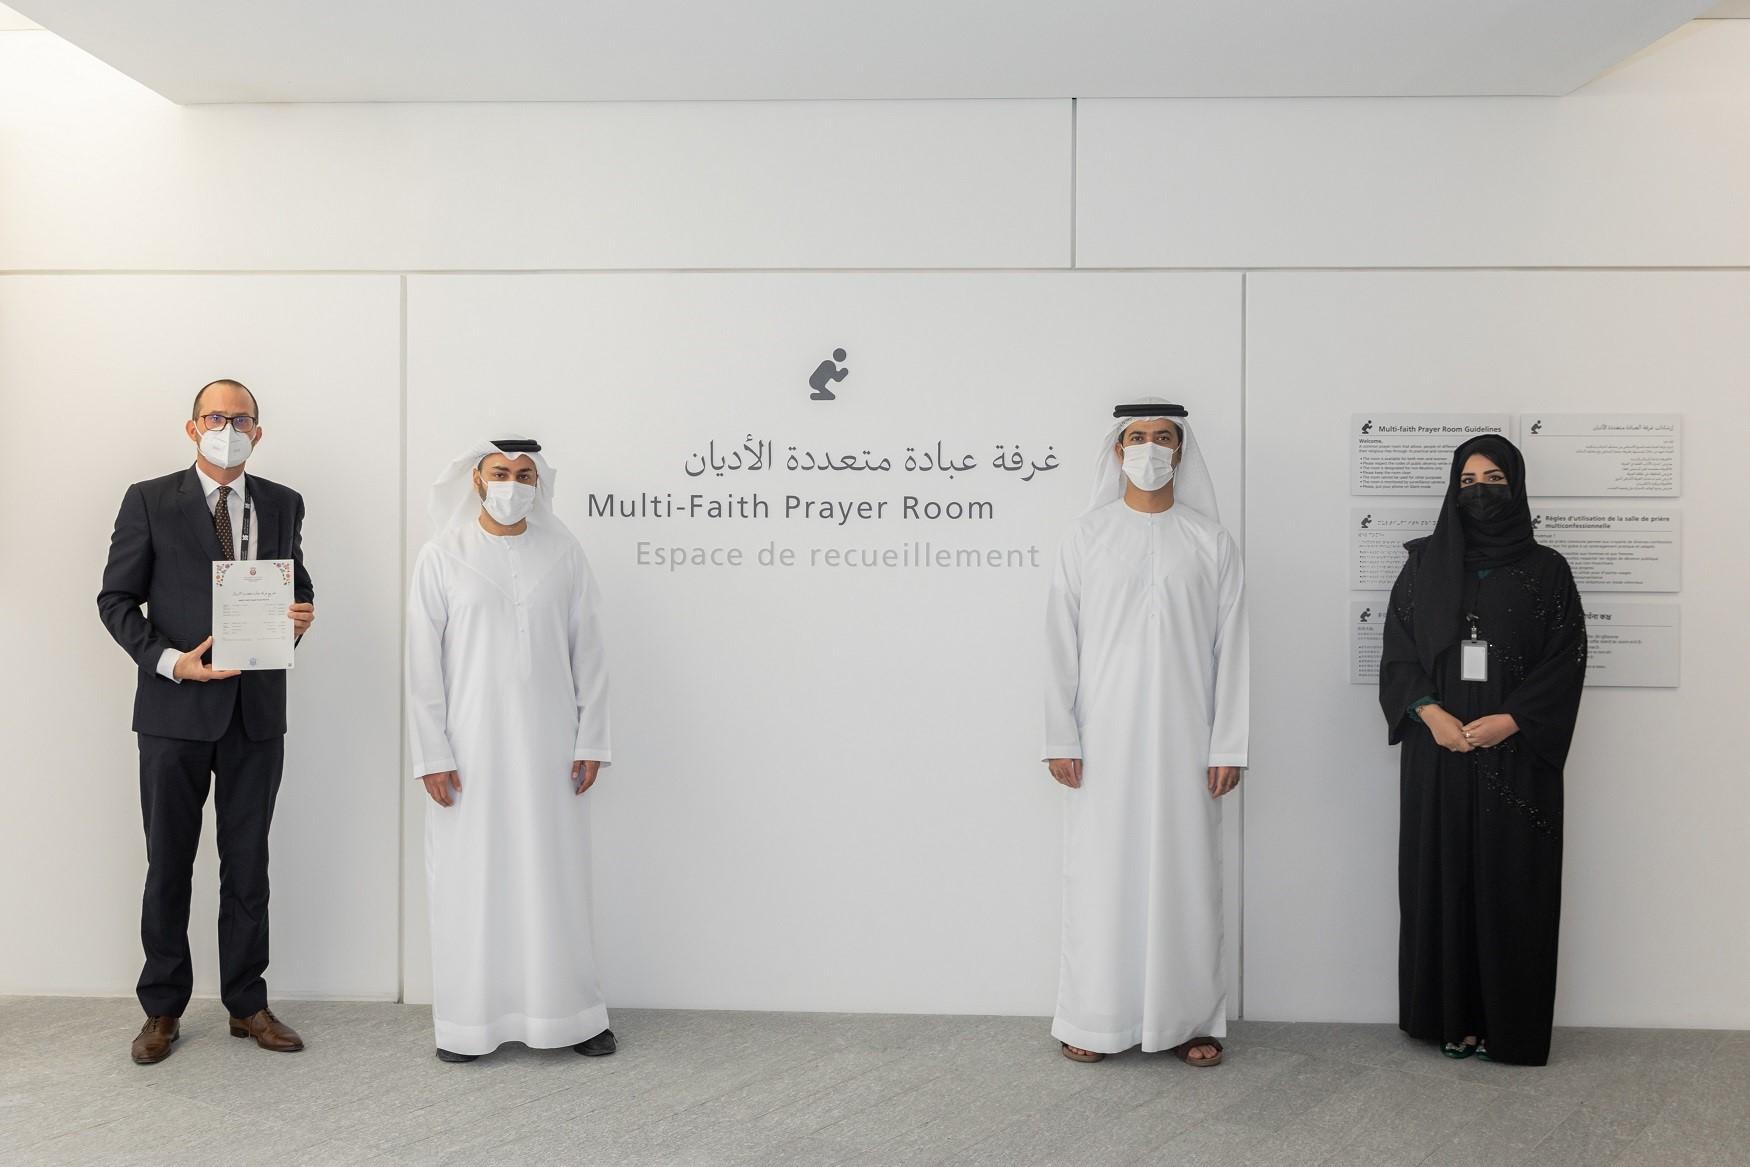 Multi prayer room with Louvre Abu Dhabi